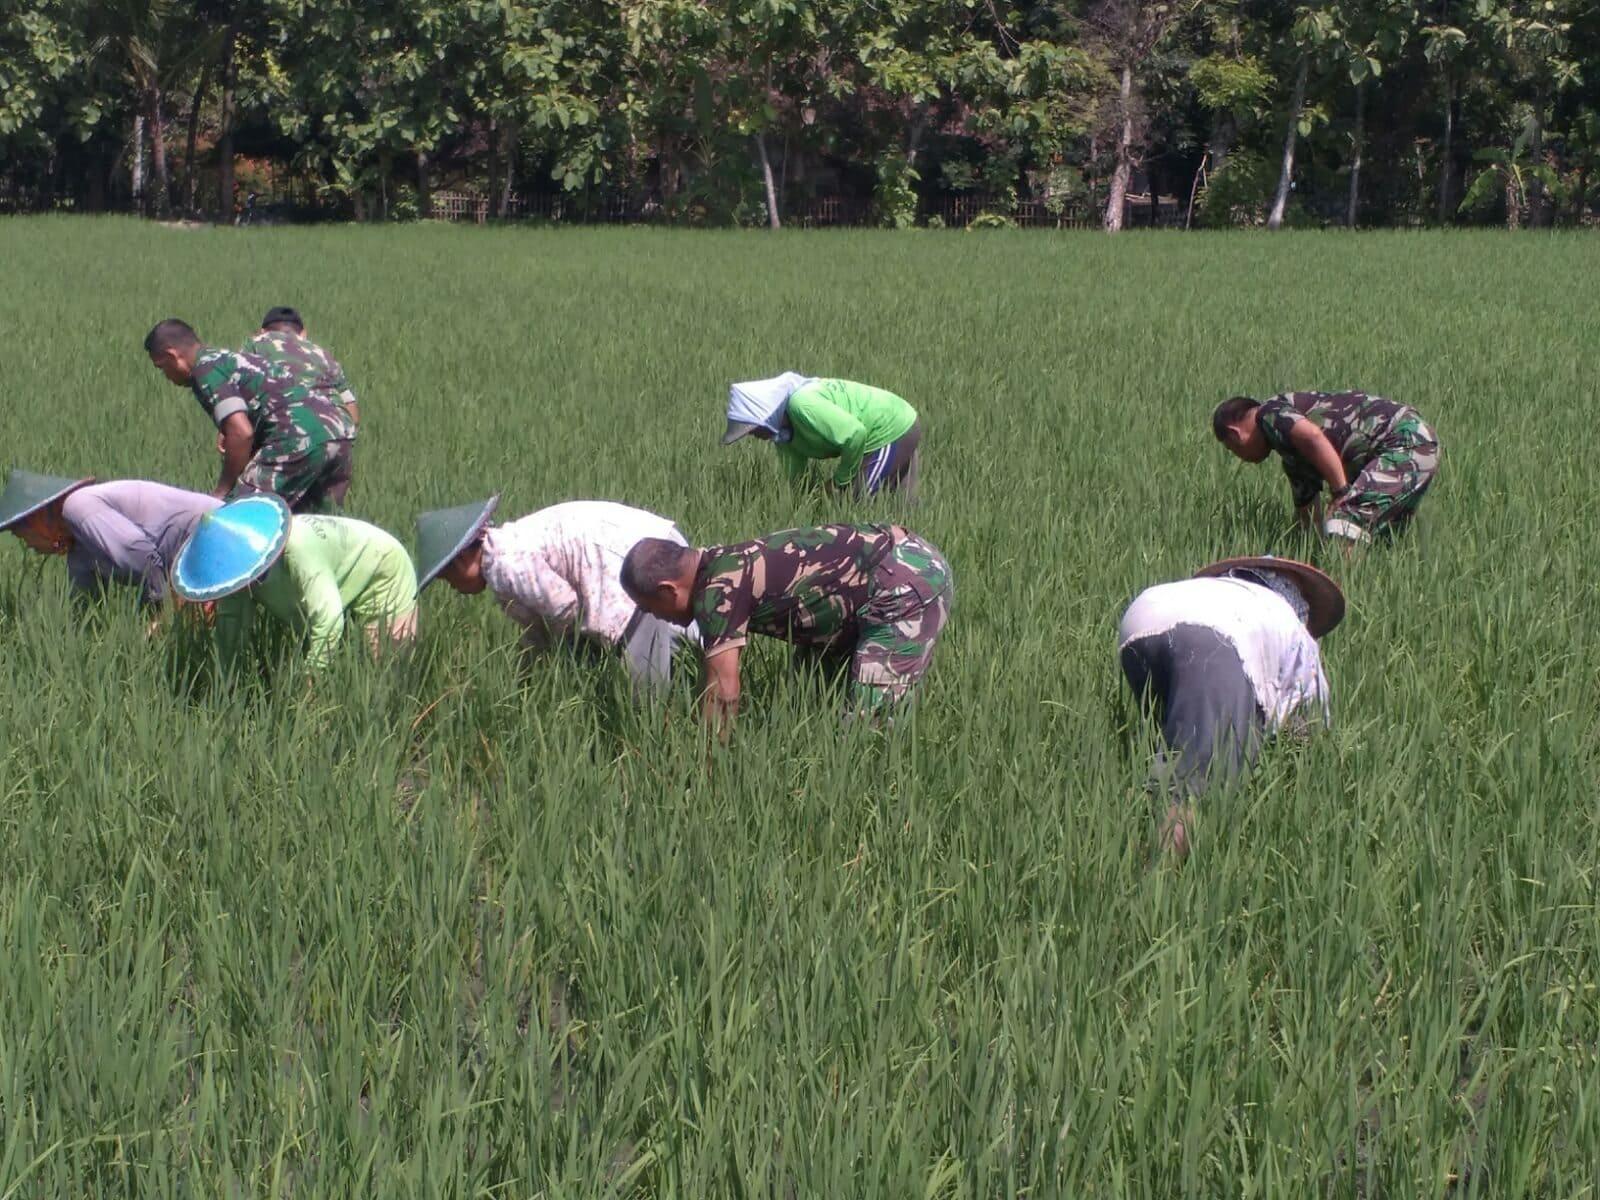 Swasembada Pangan, Babinsa Paron dan Petani Giat Monitoring Tanaman